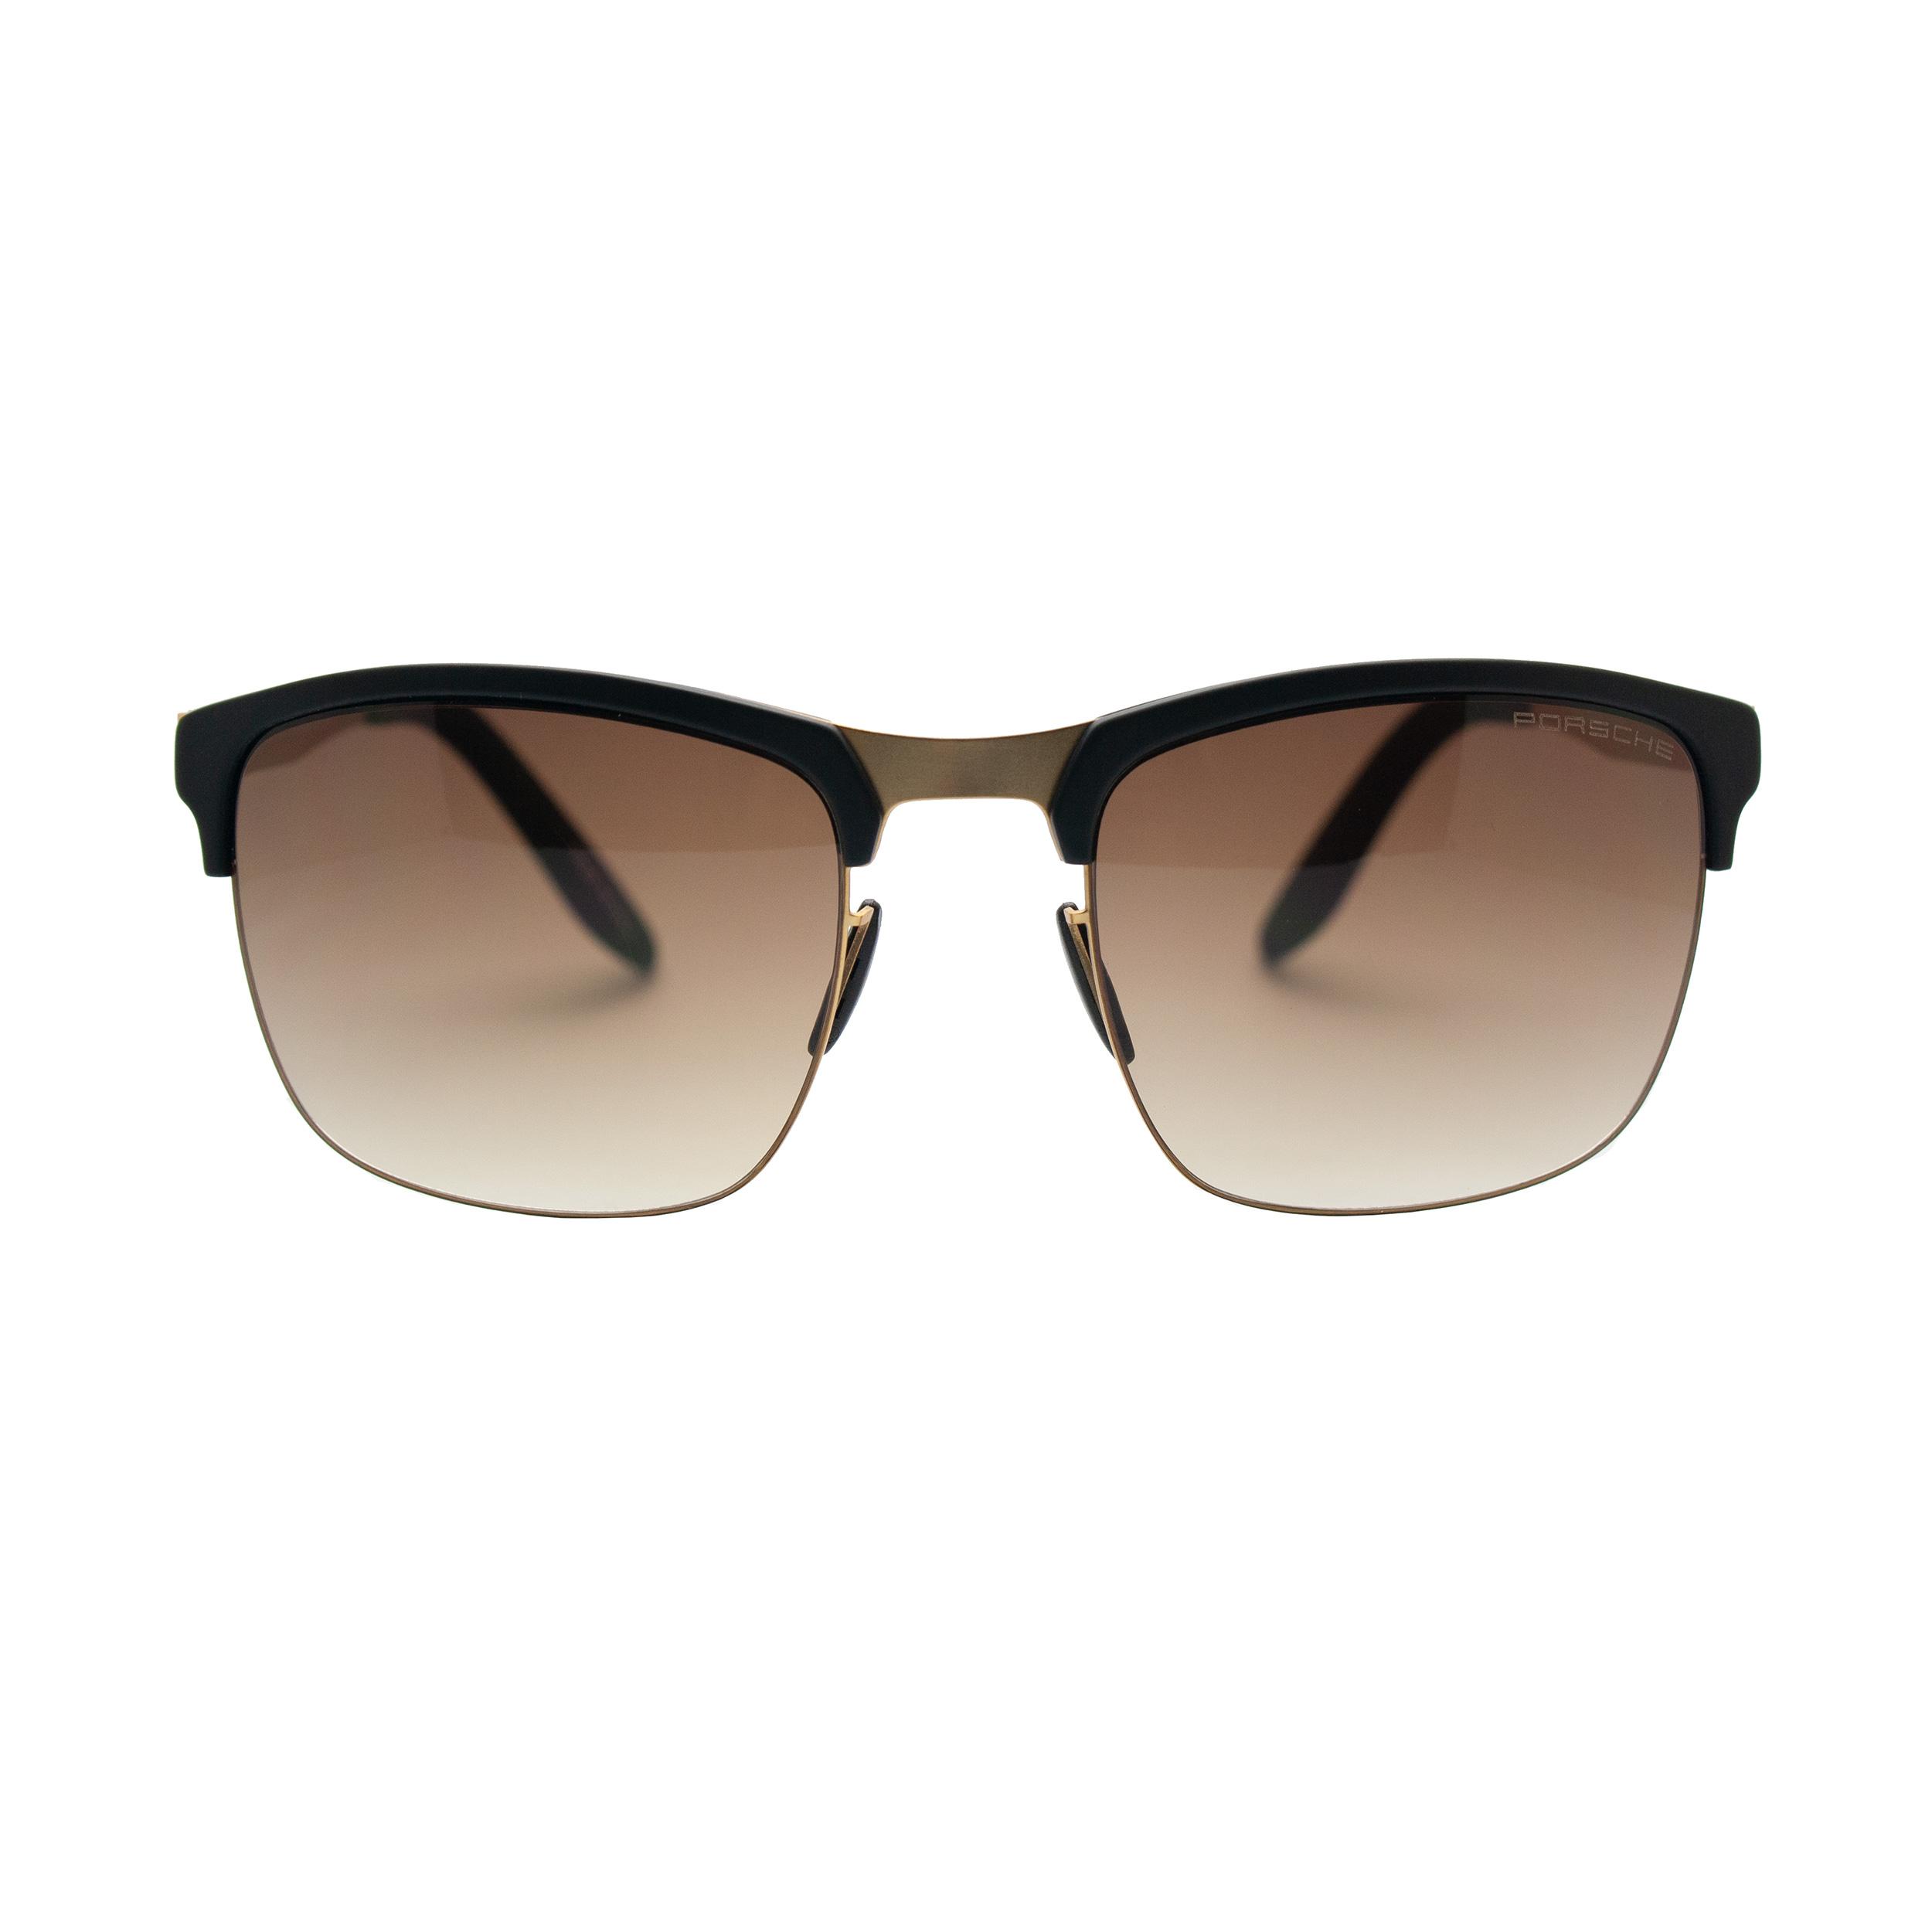 عینک آفتابی پورش دیزاین مدل P8937 SNT G